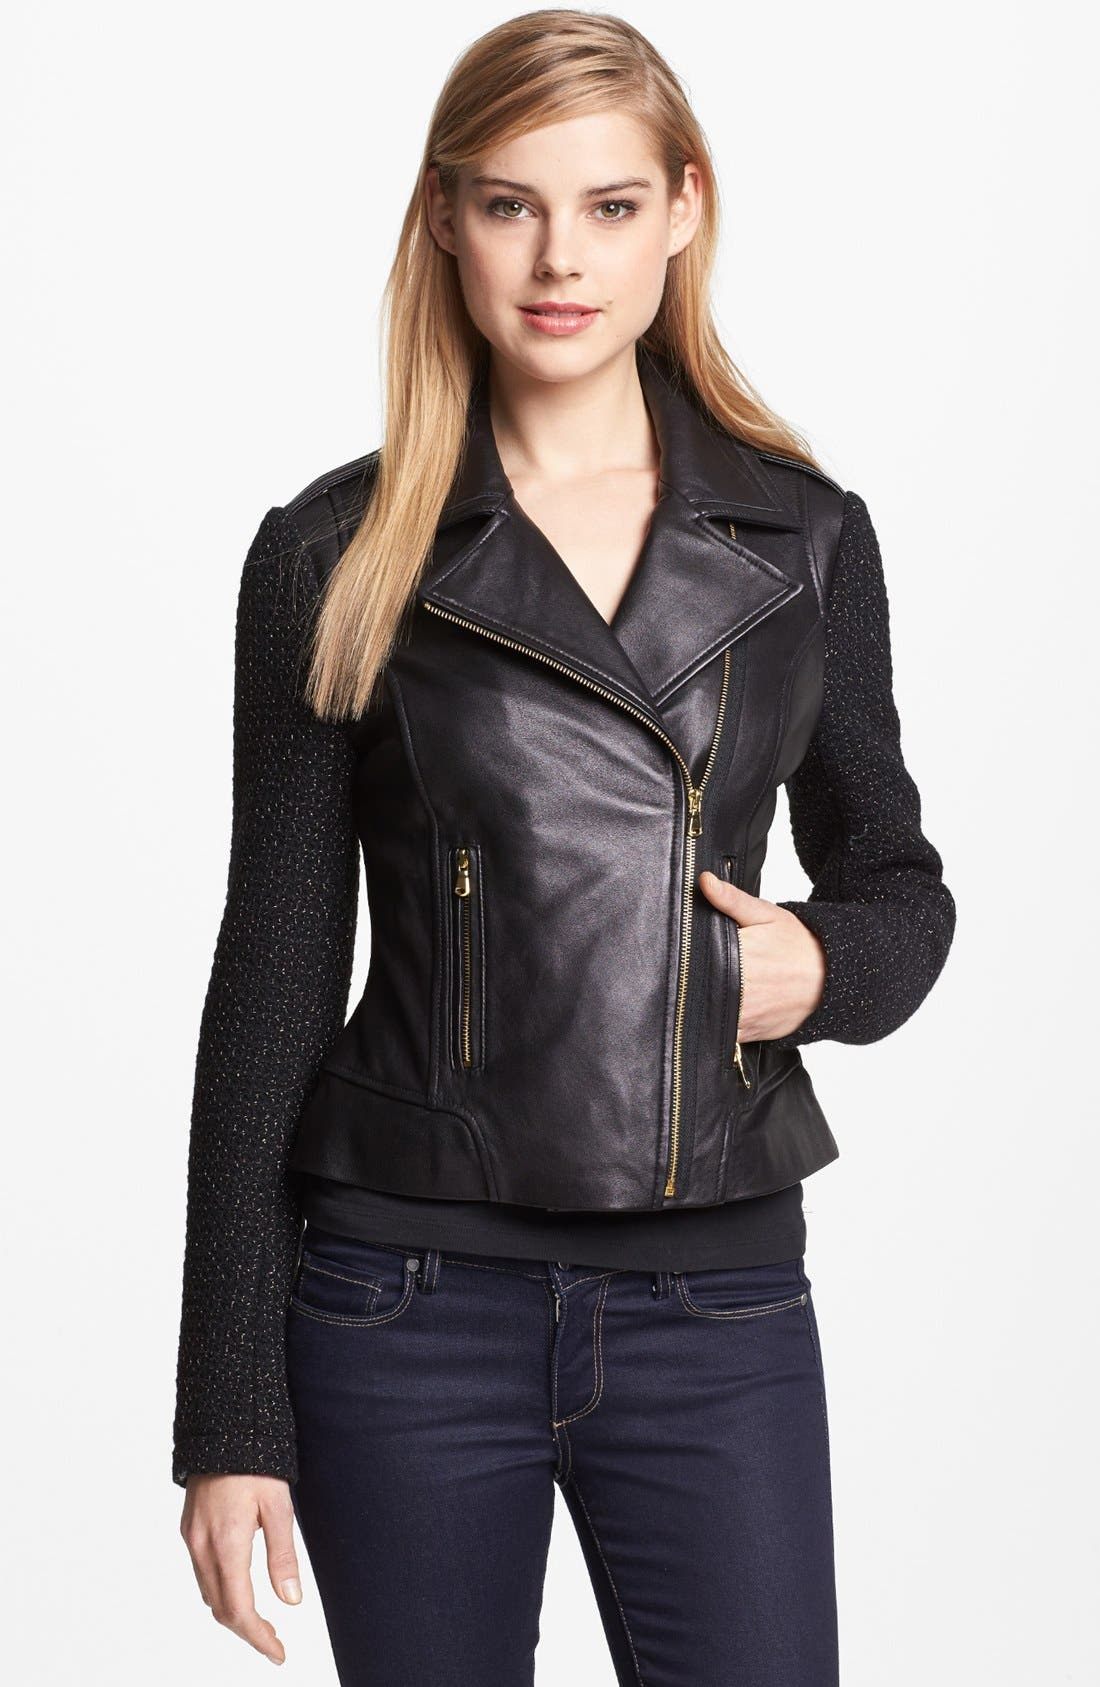 Alternate Image 1 Selected - French Connection Leather & Metallic Tweed Moto Jacket